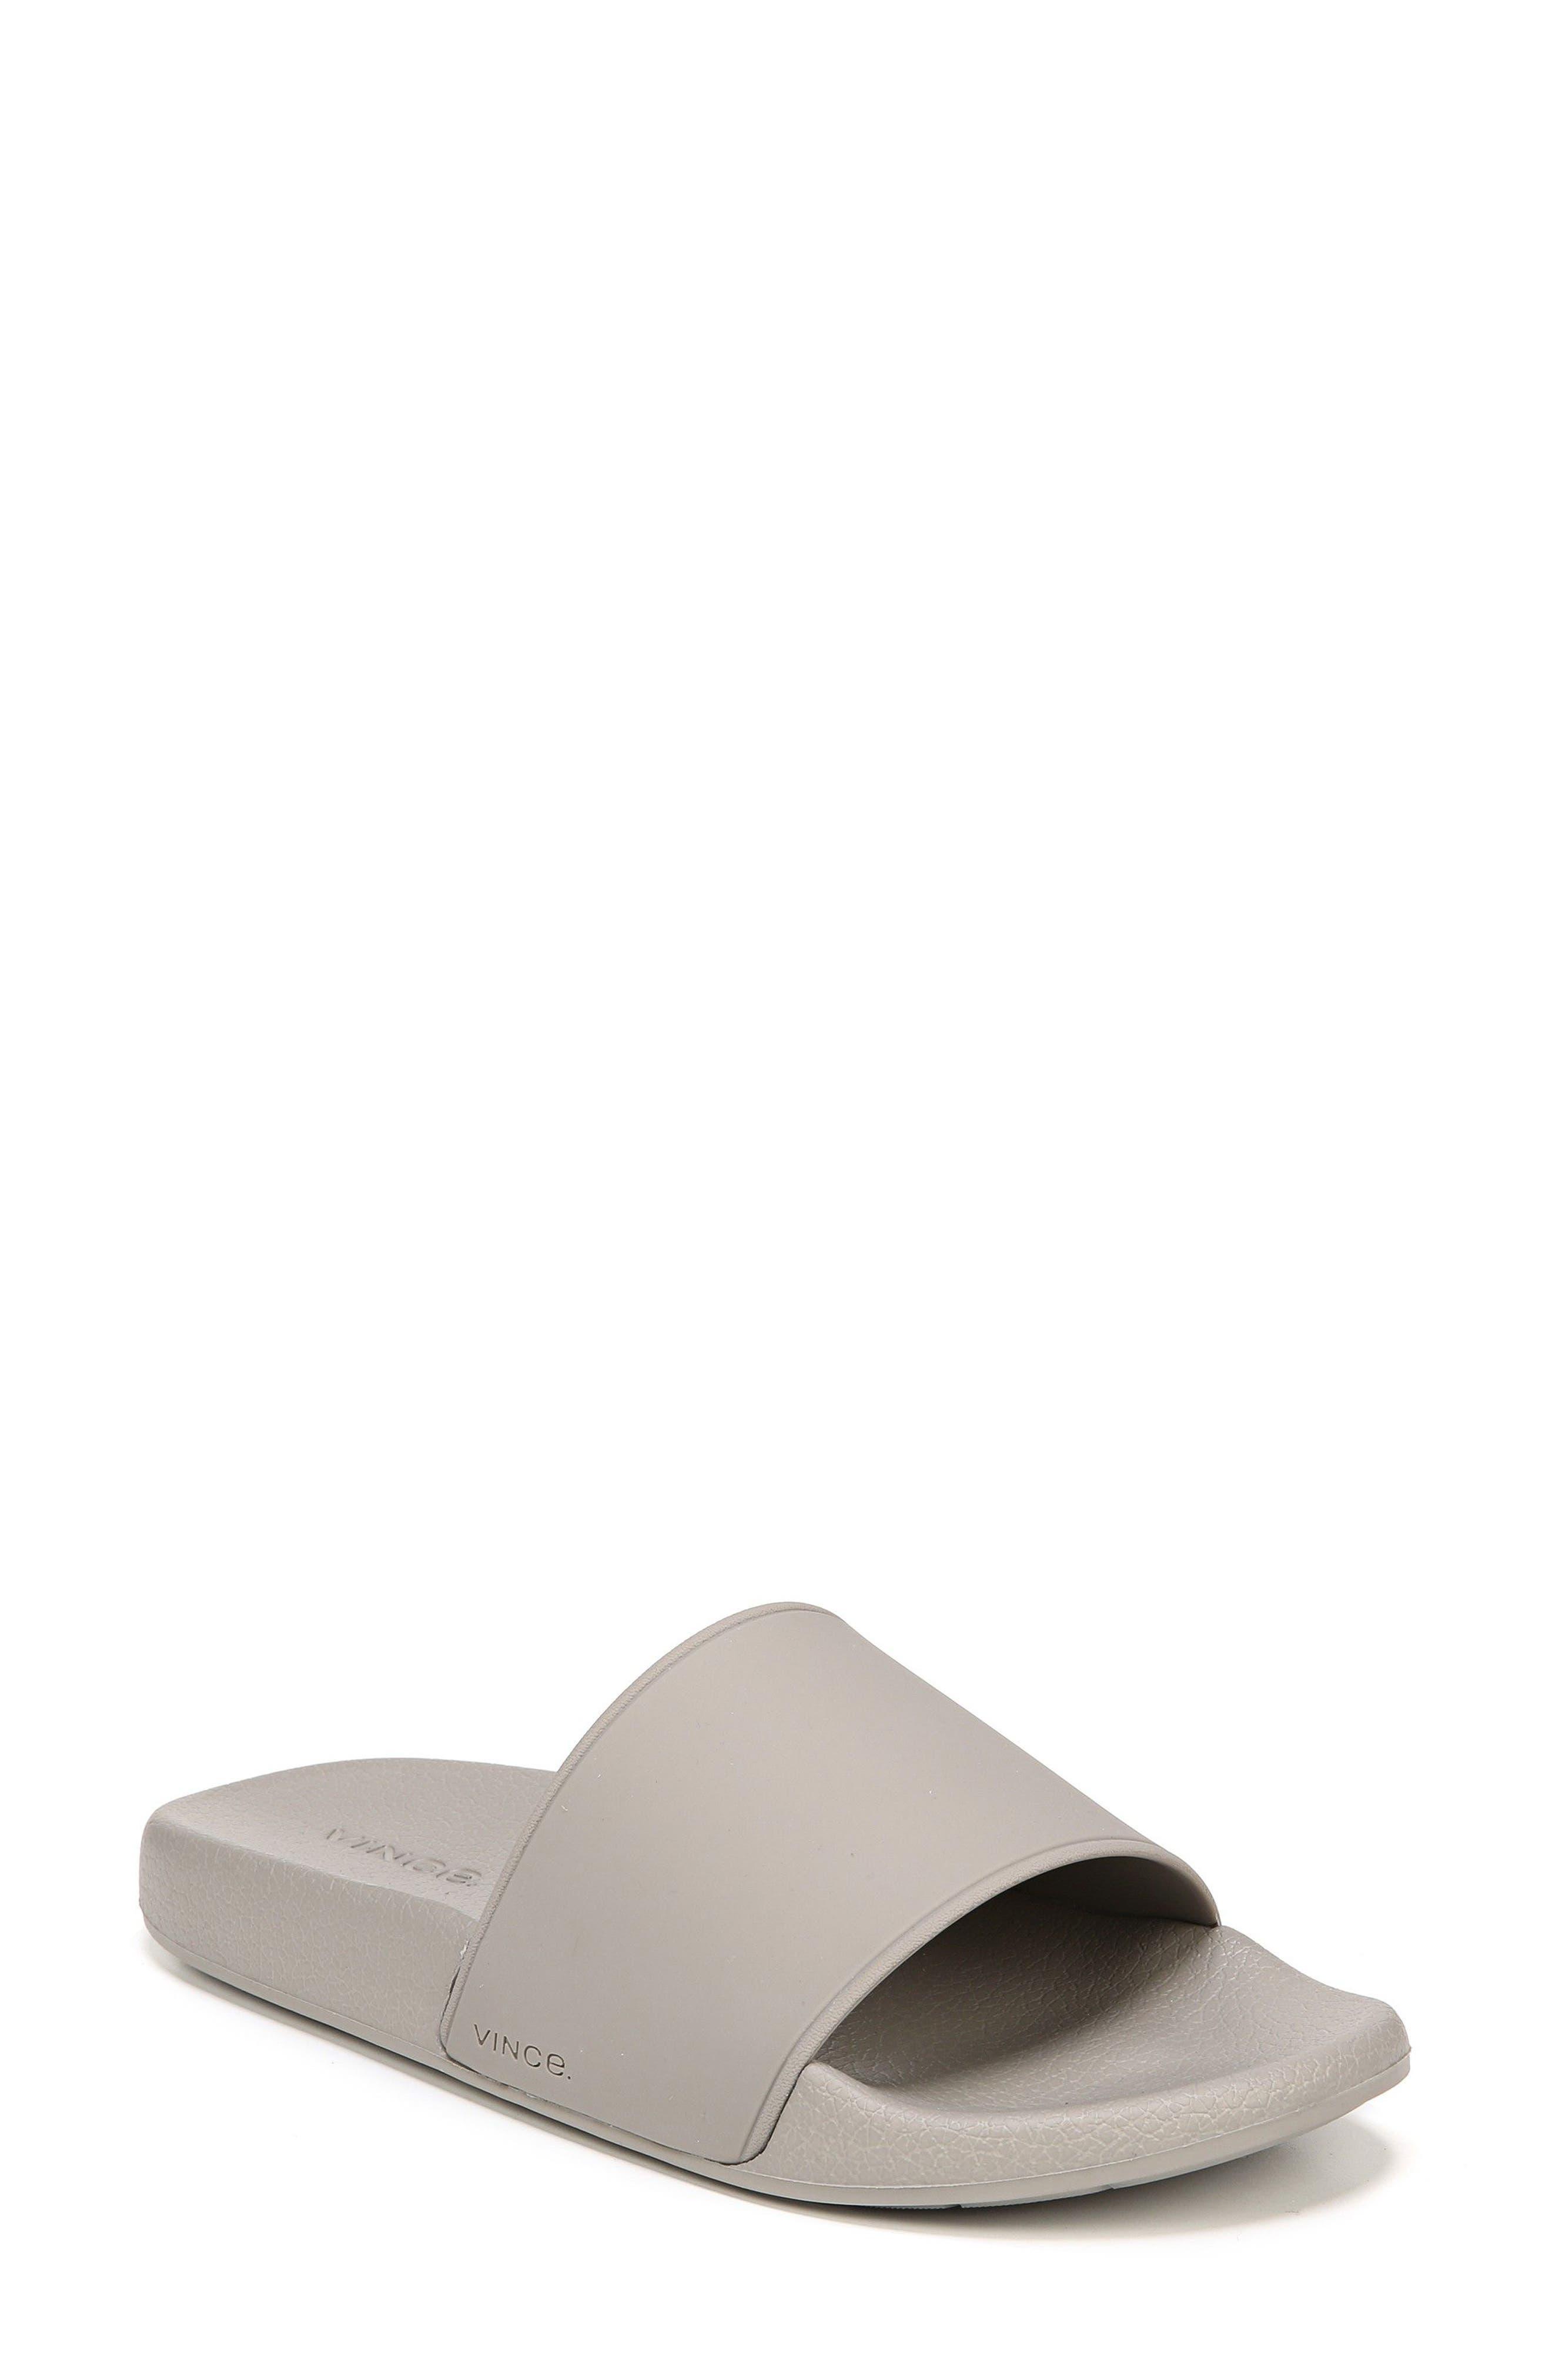 Alternate Image 1 Selected - Vince Westcoast Slide Sandal (Women)